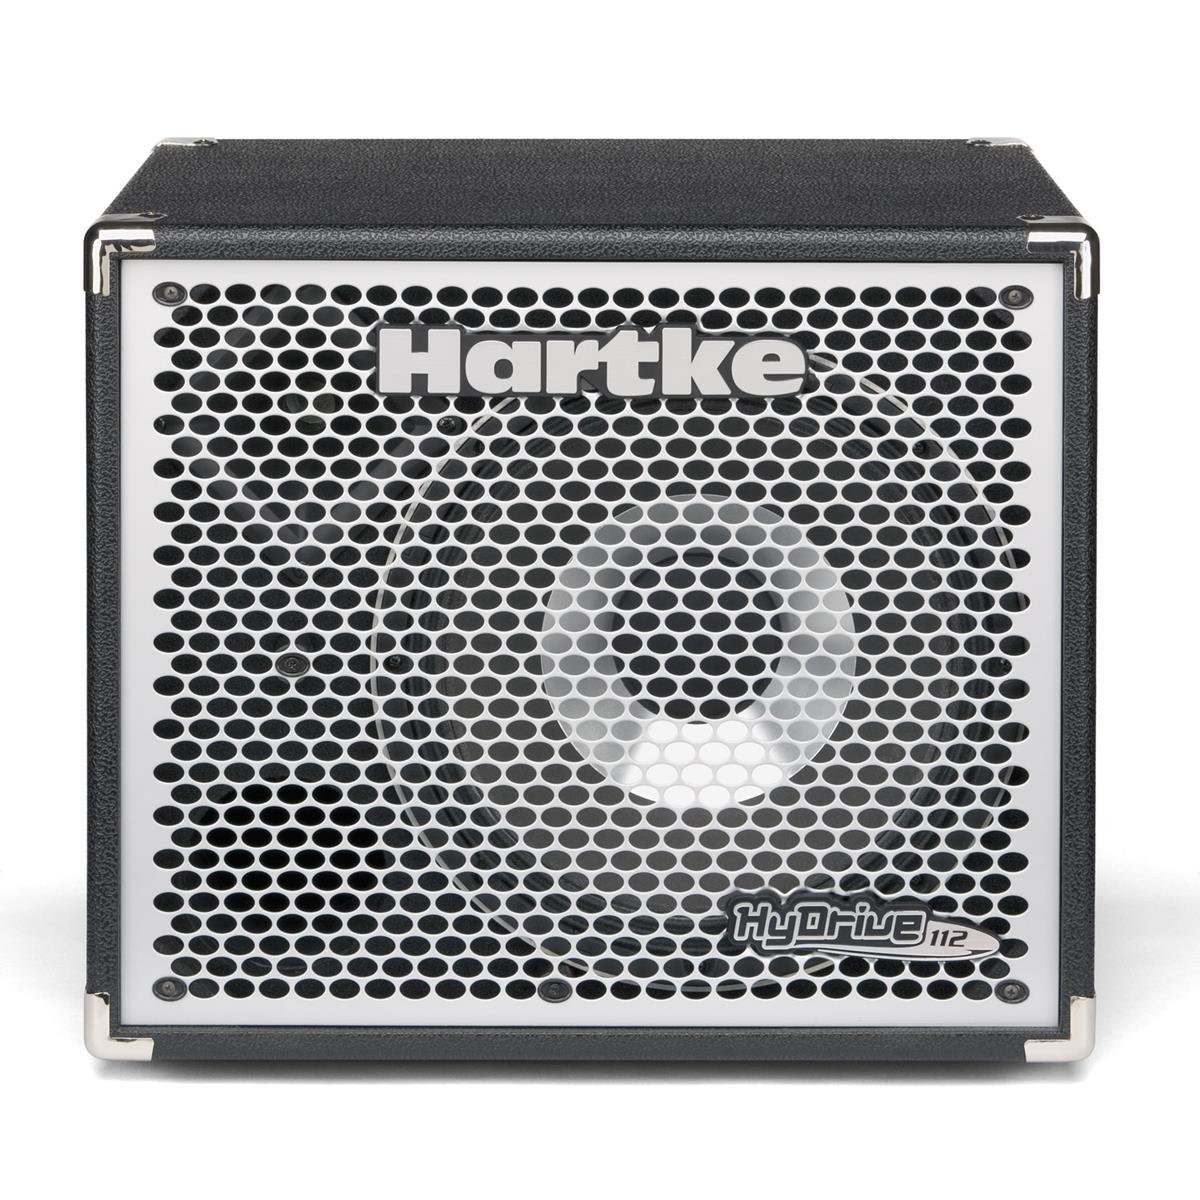 Hartke HyDrive HD112 - 1x12 -  300W